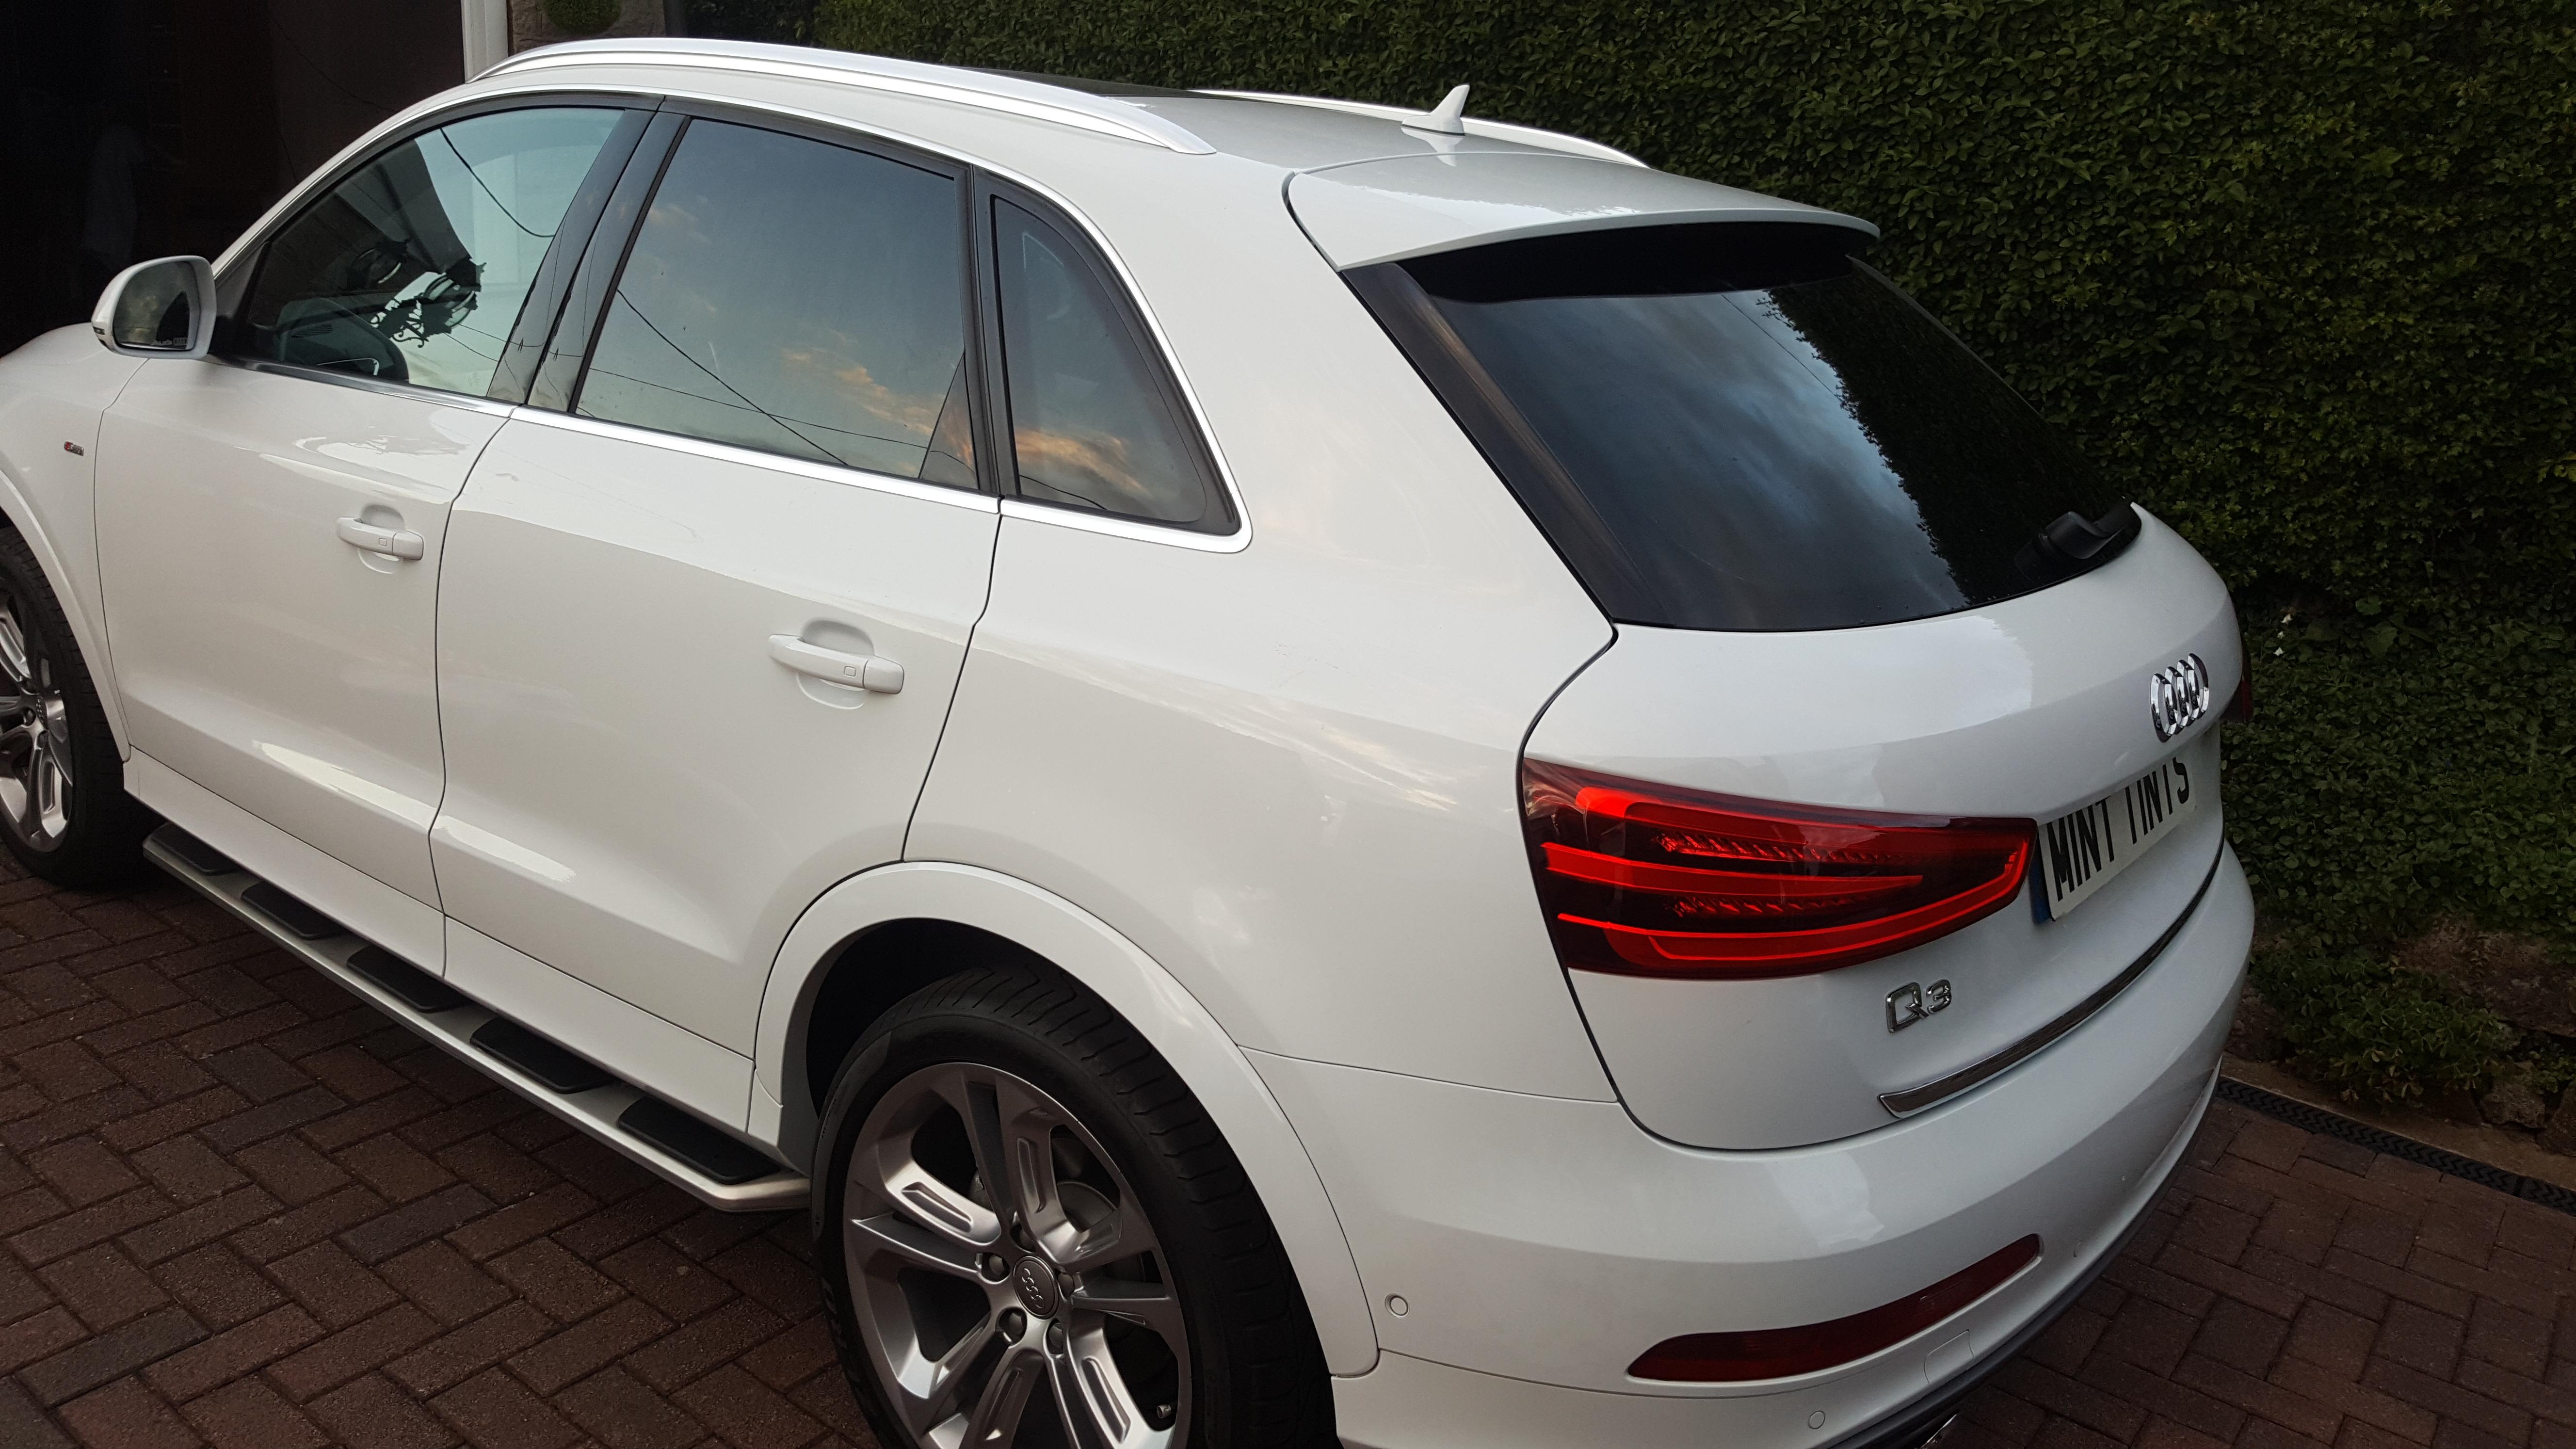 Audi Q3 - 20% Dark Smoke Tint